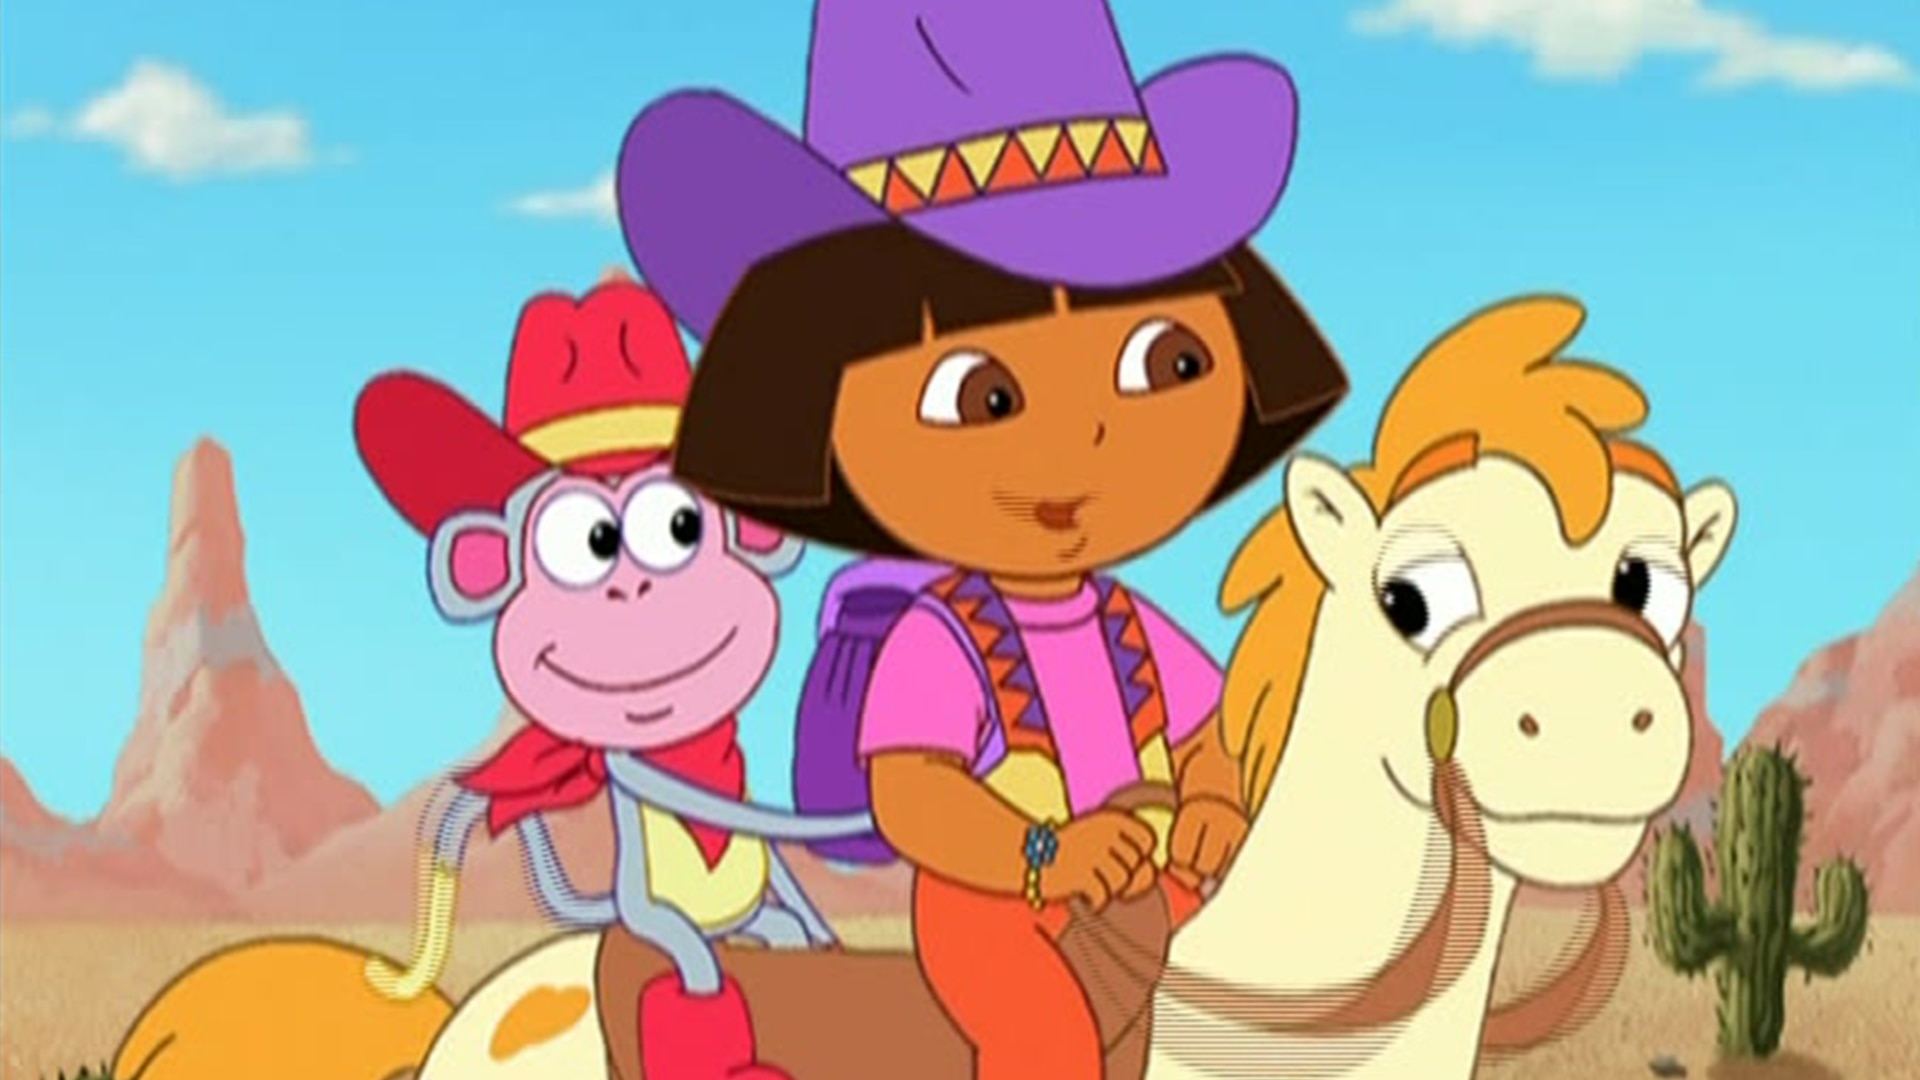 Pinto, The Pony Express